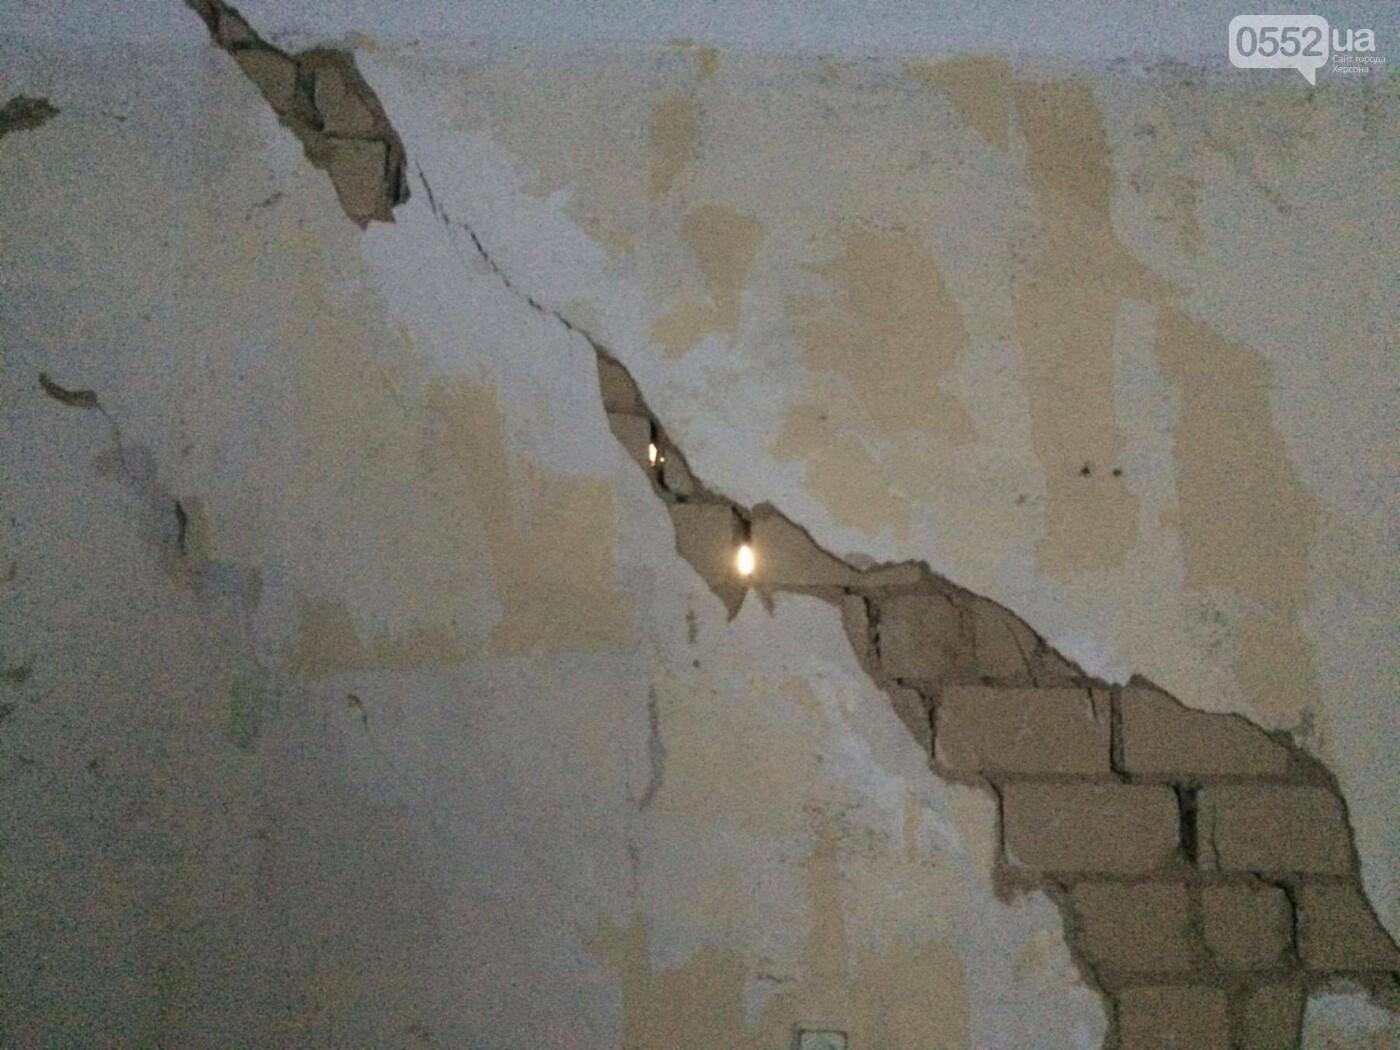 В Херсоне глава ОГА встретился с жильцами аварийного дома, фото-5